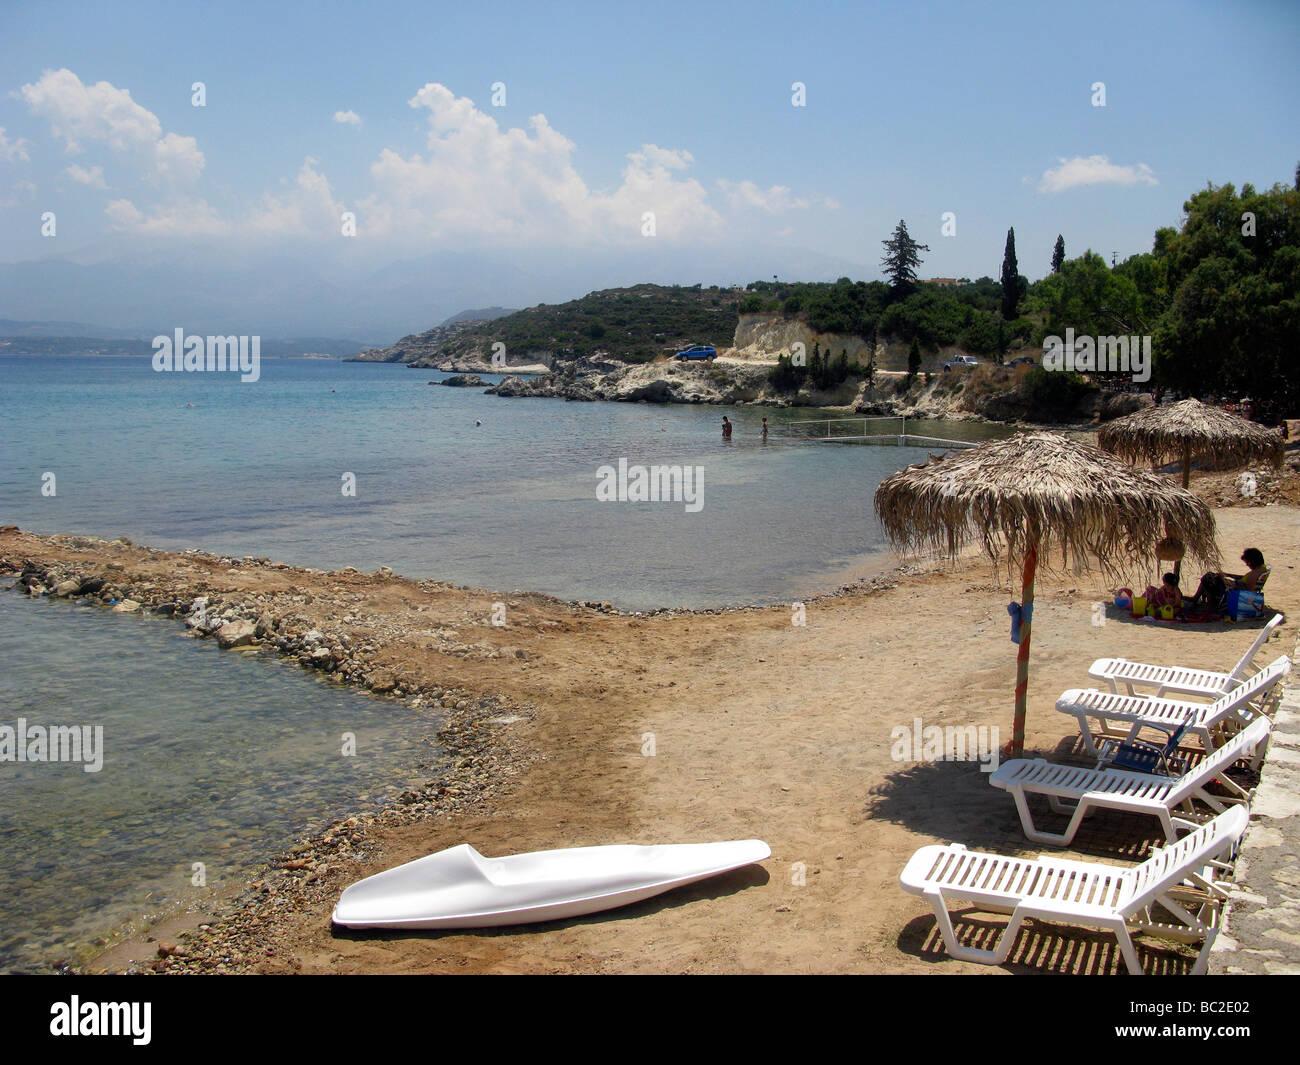 Greece West Crete Marathi Beach Akrotiri district of Chania - Stock Image